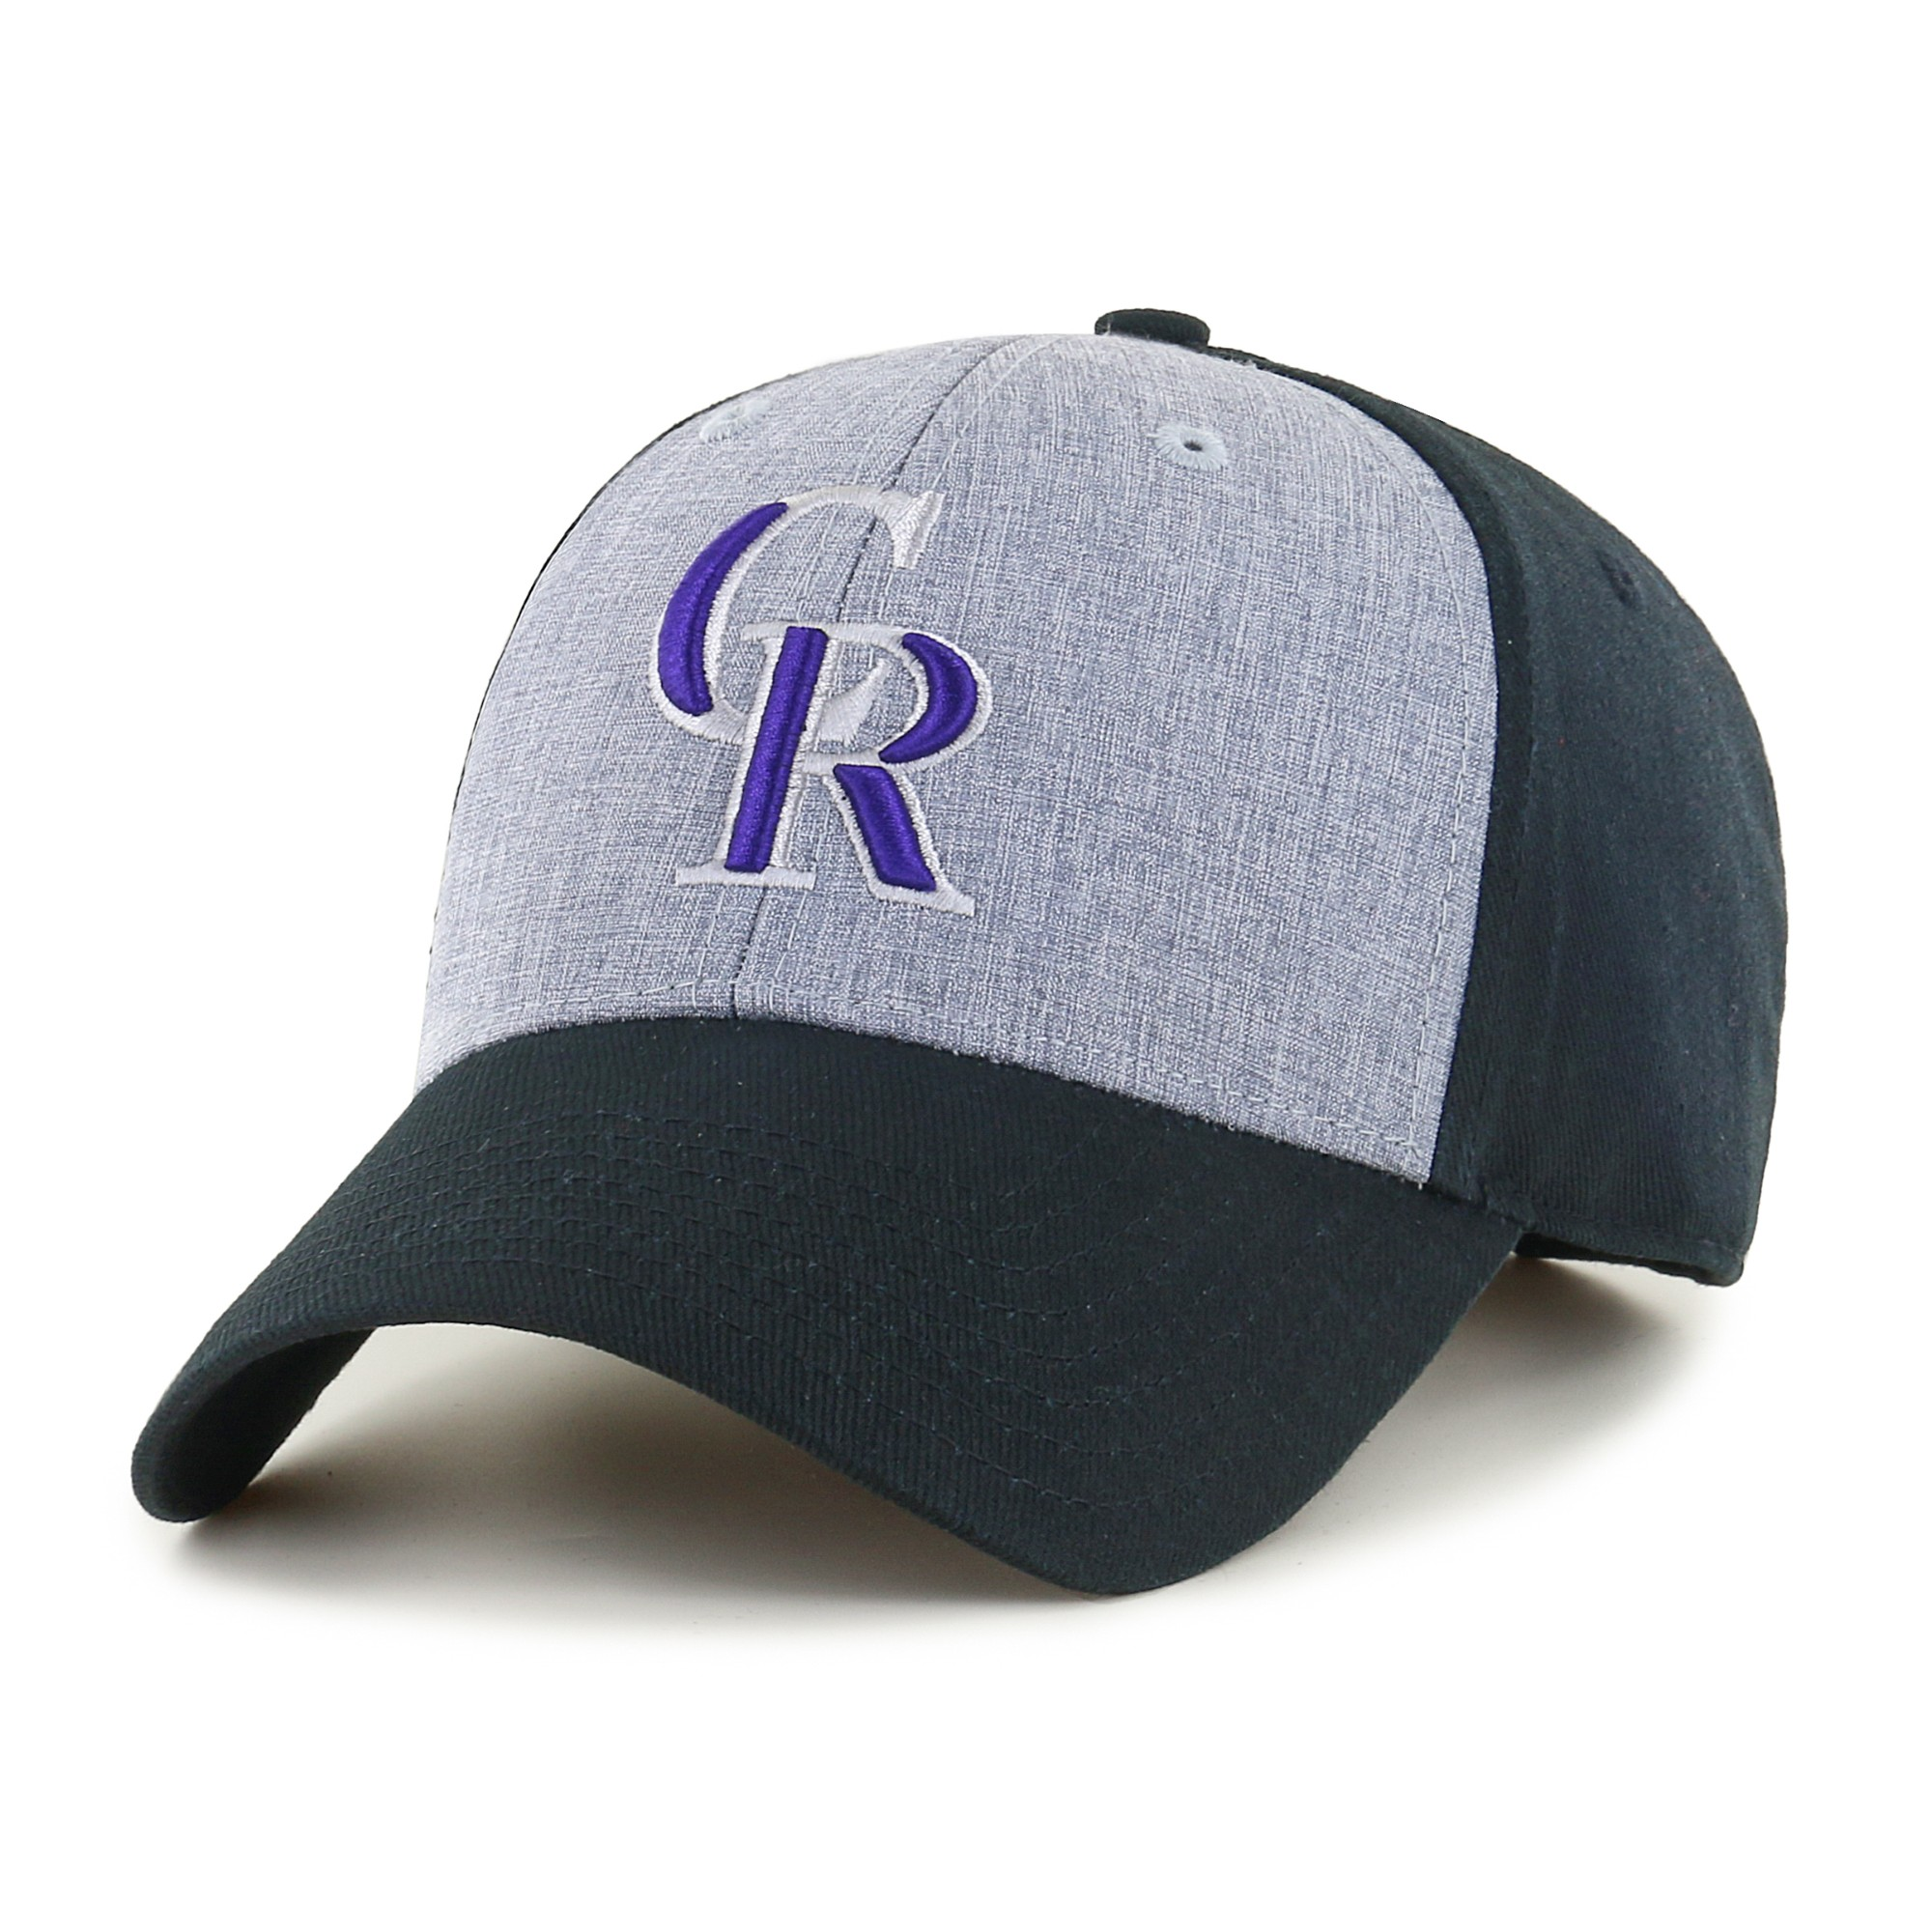 Fan Favorite MLB Essential Adjustable Hat, Colorado Rockies